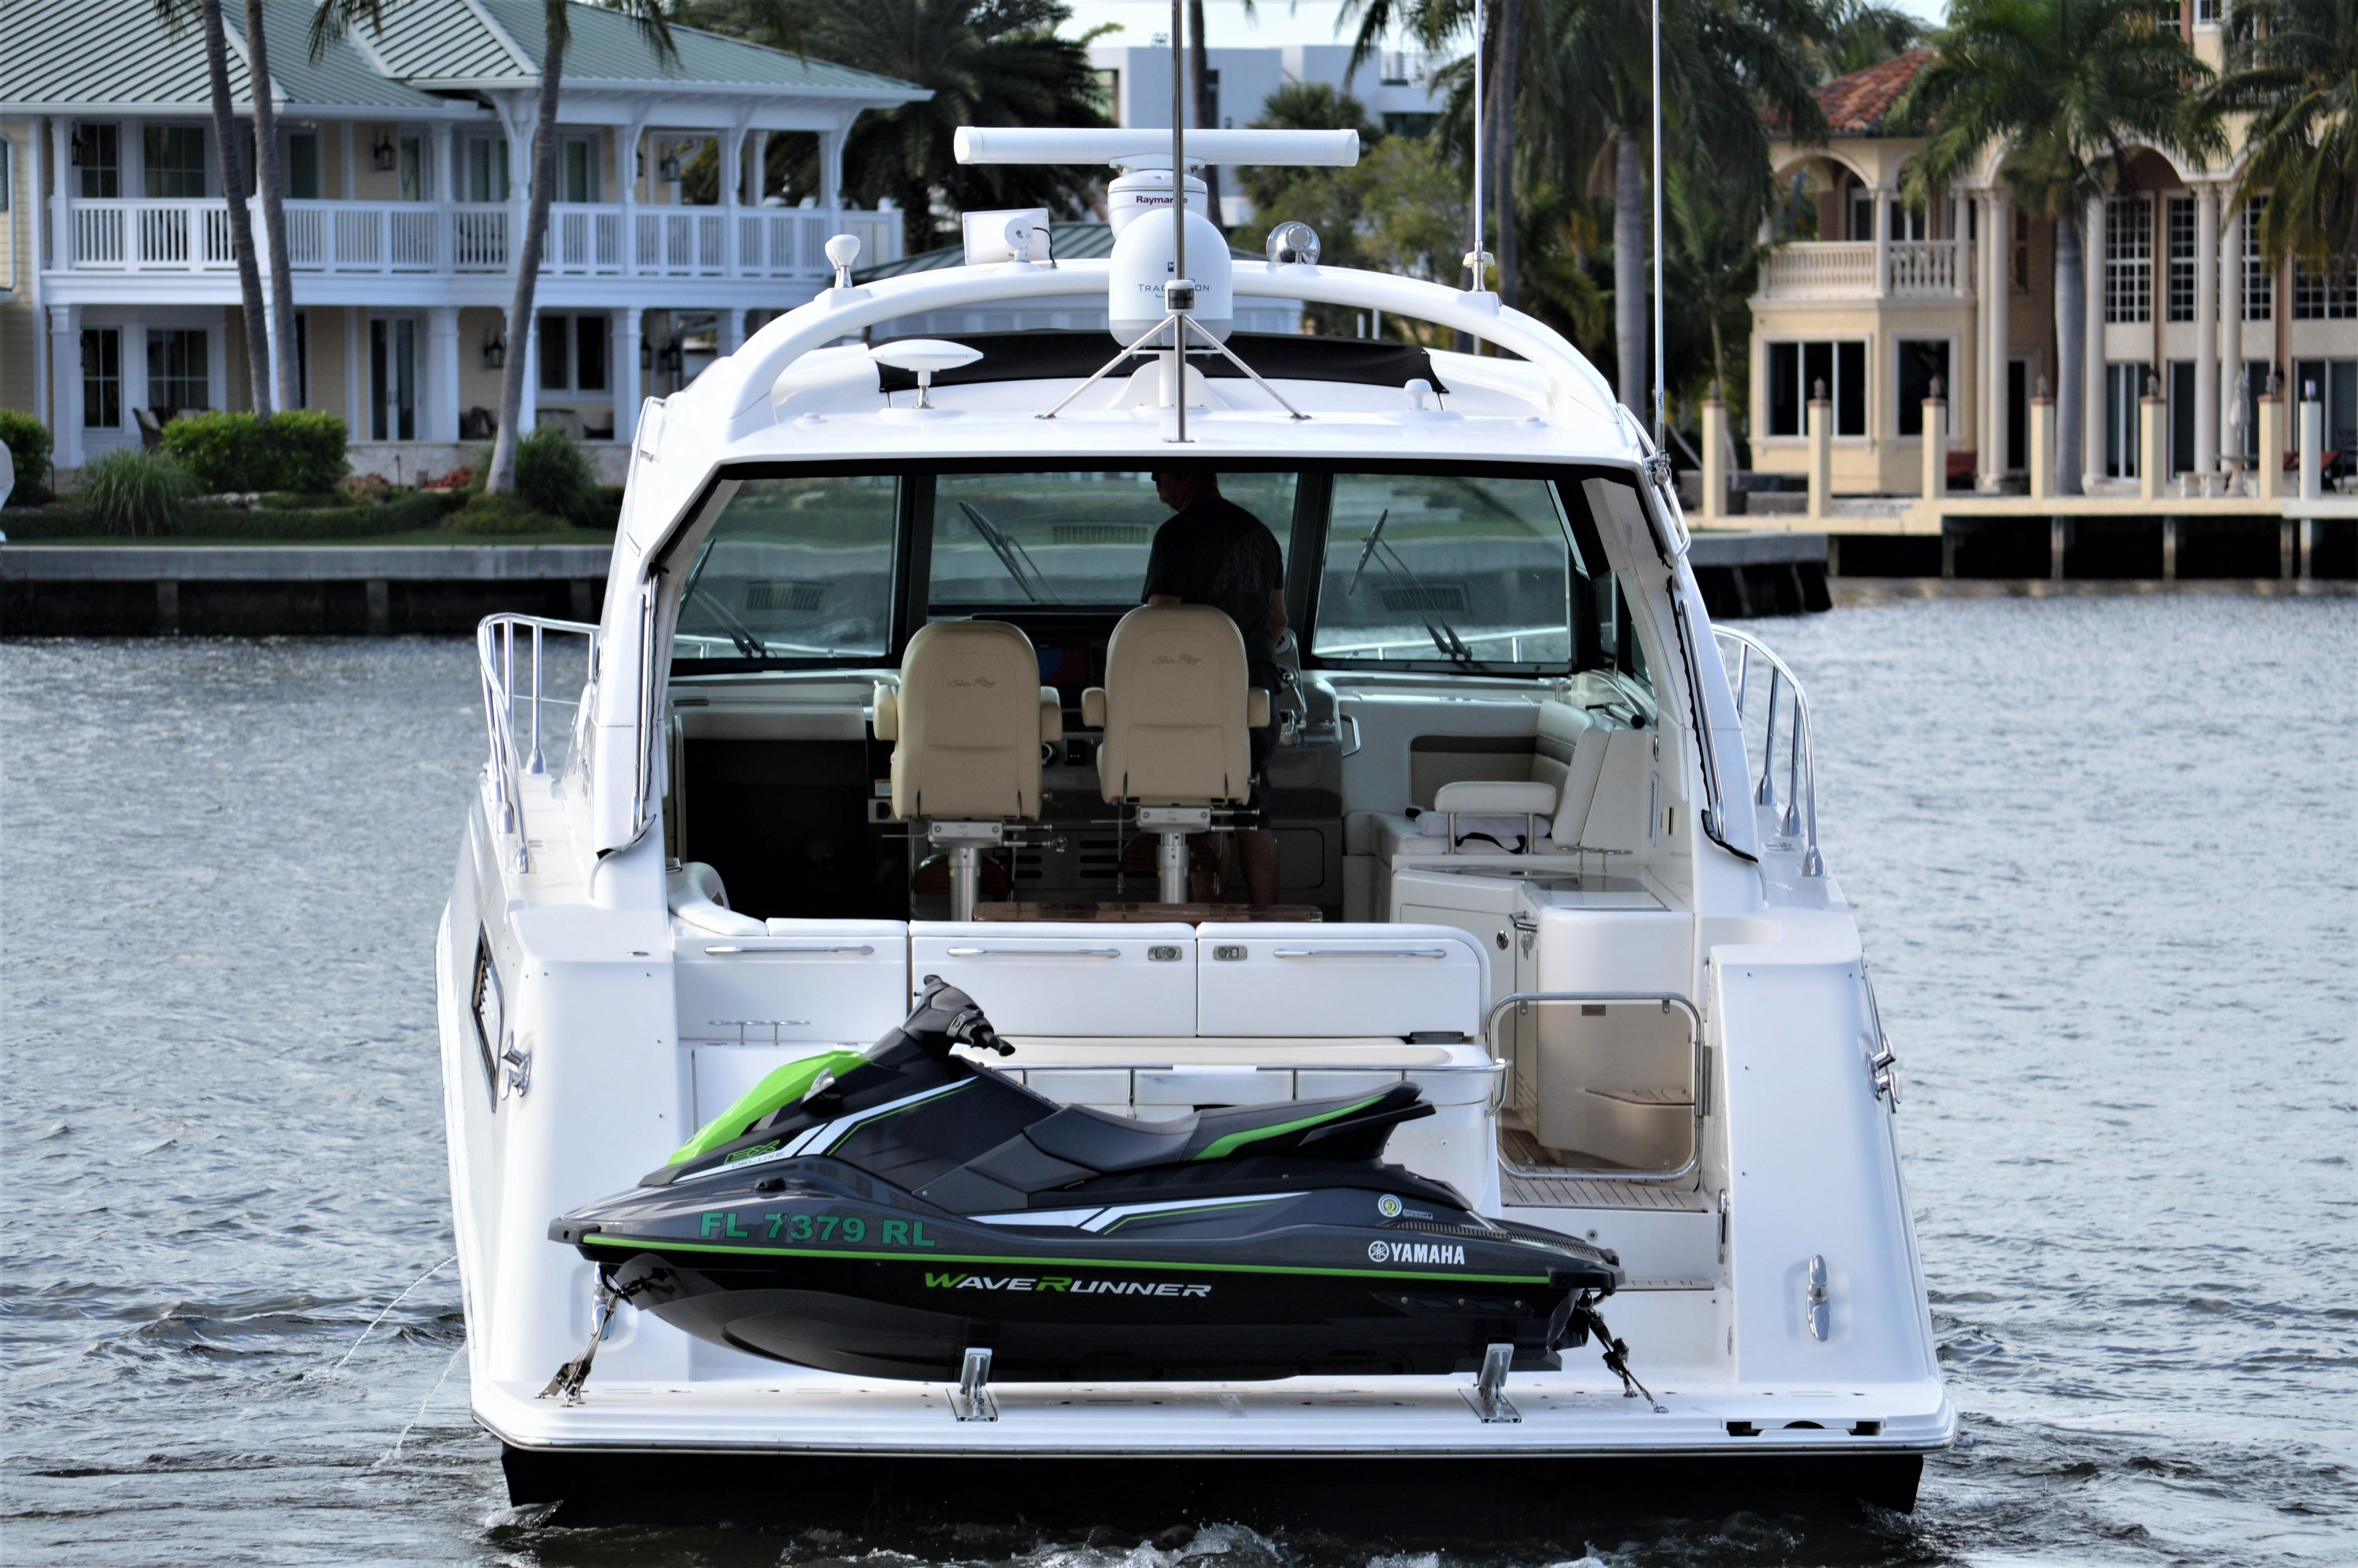 2012 Sea Ray 540 Lazy Blum - Aft Profile